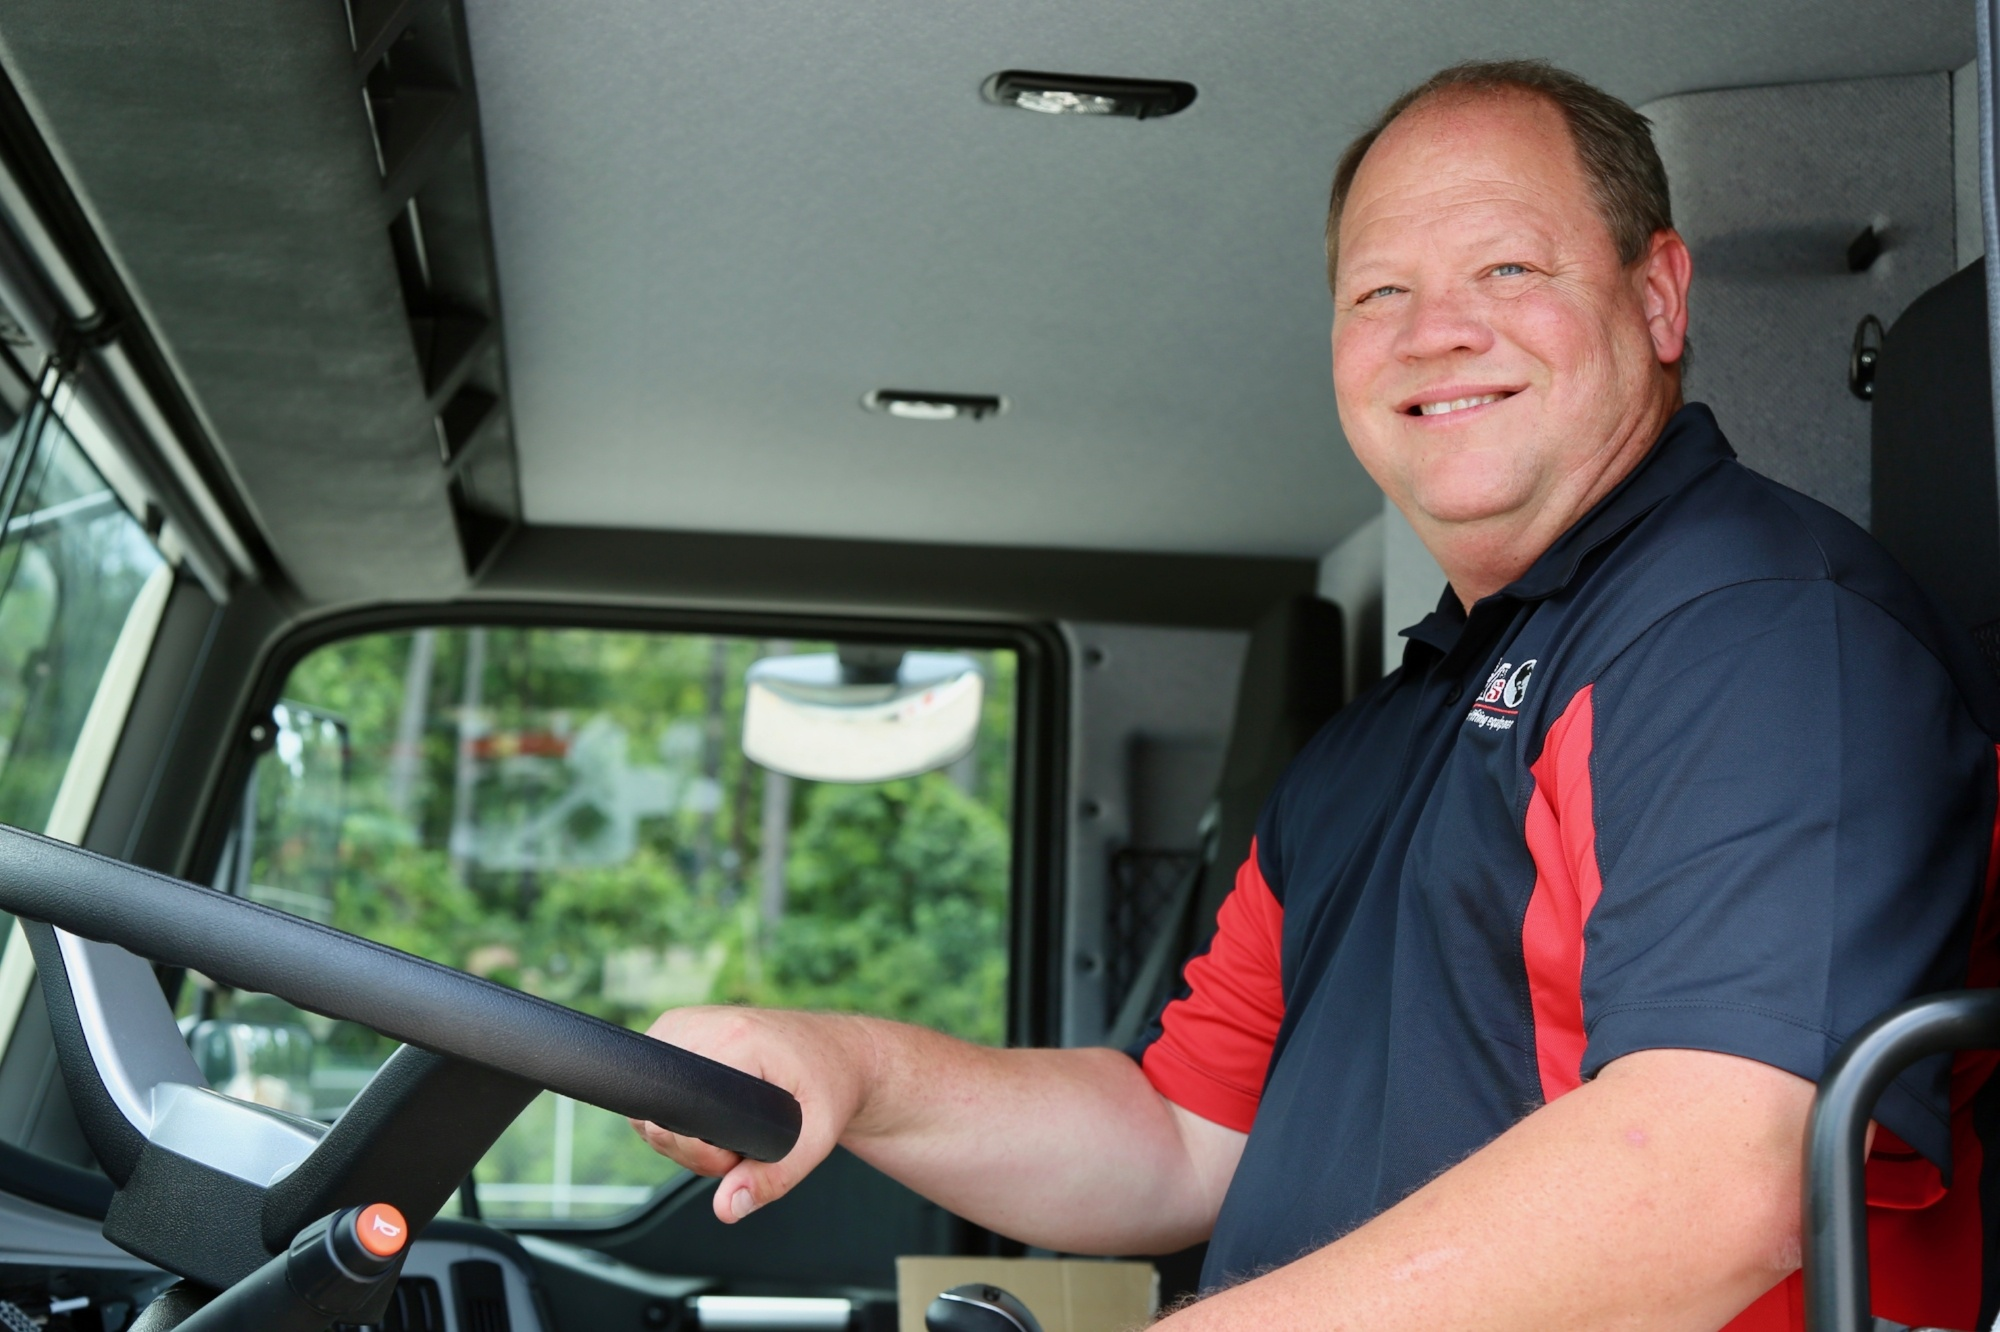 Randy Harris, Large Crane Specialist at CraneWorks